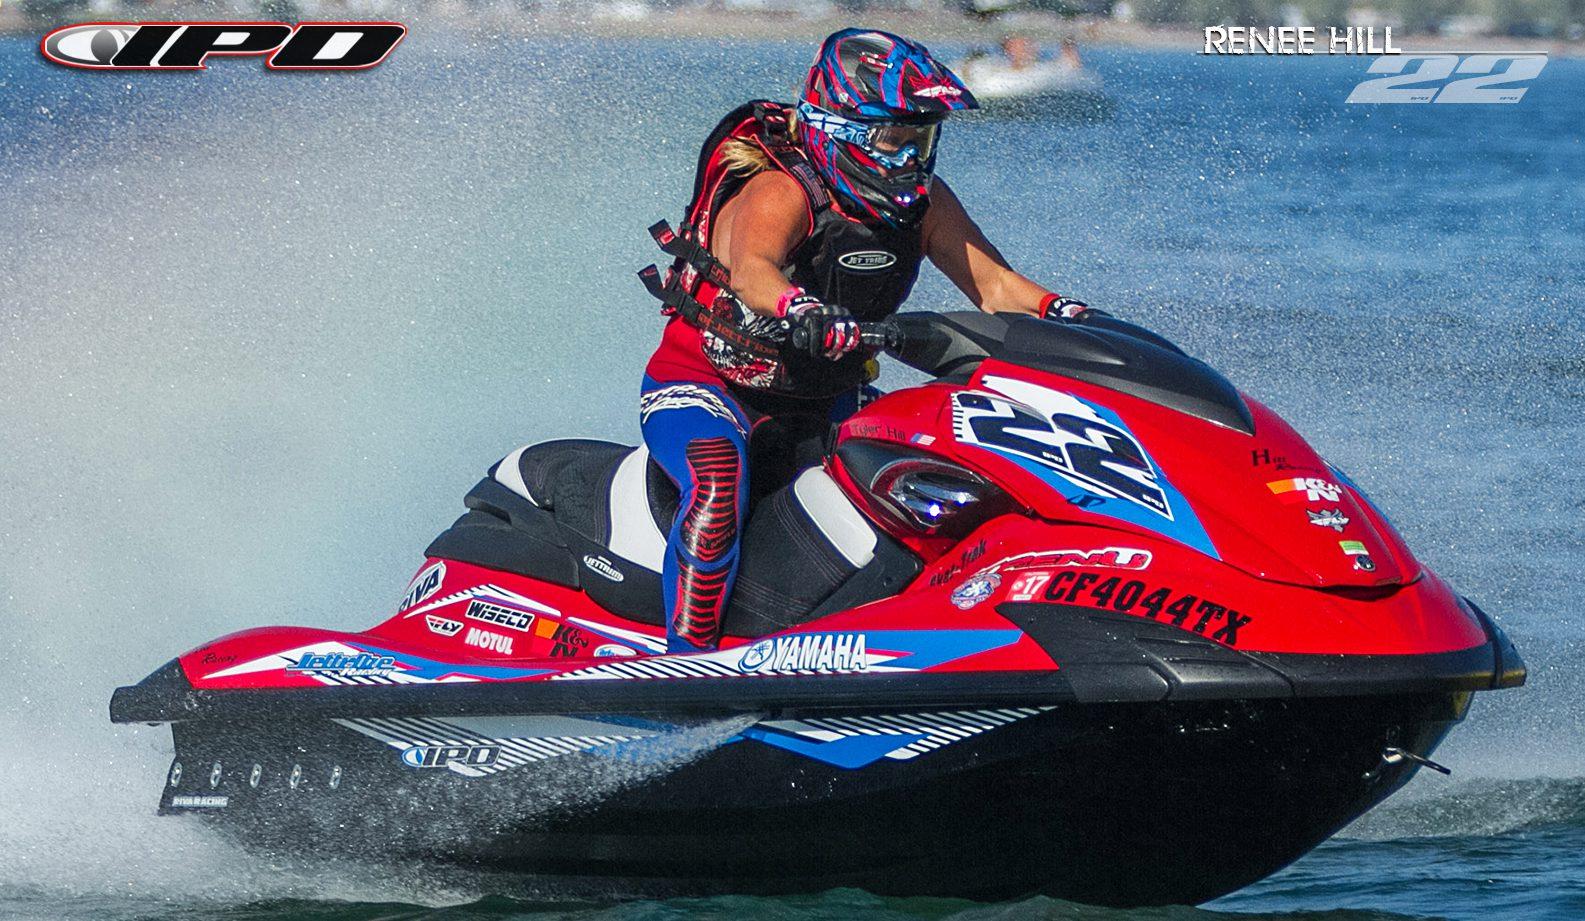 Ipd jet ski graphics race inspired jet ski graphics for Yamaha jet skis